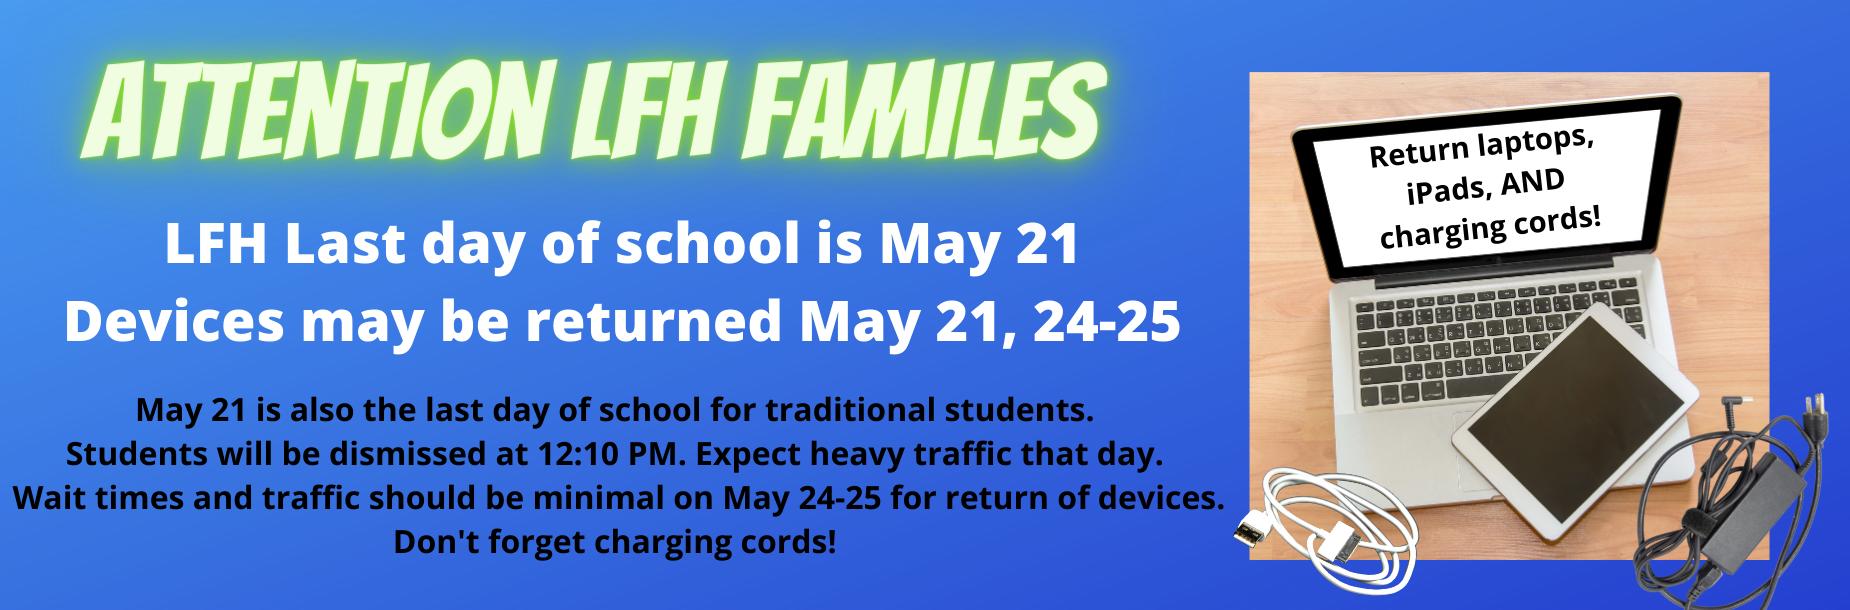 LFH device return May 24-25